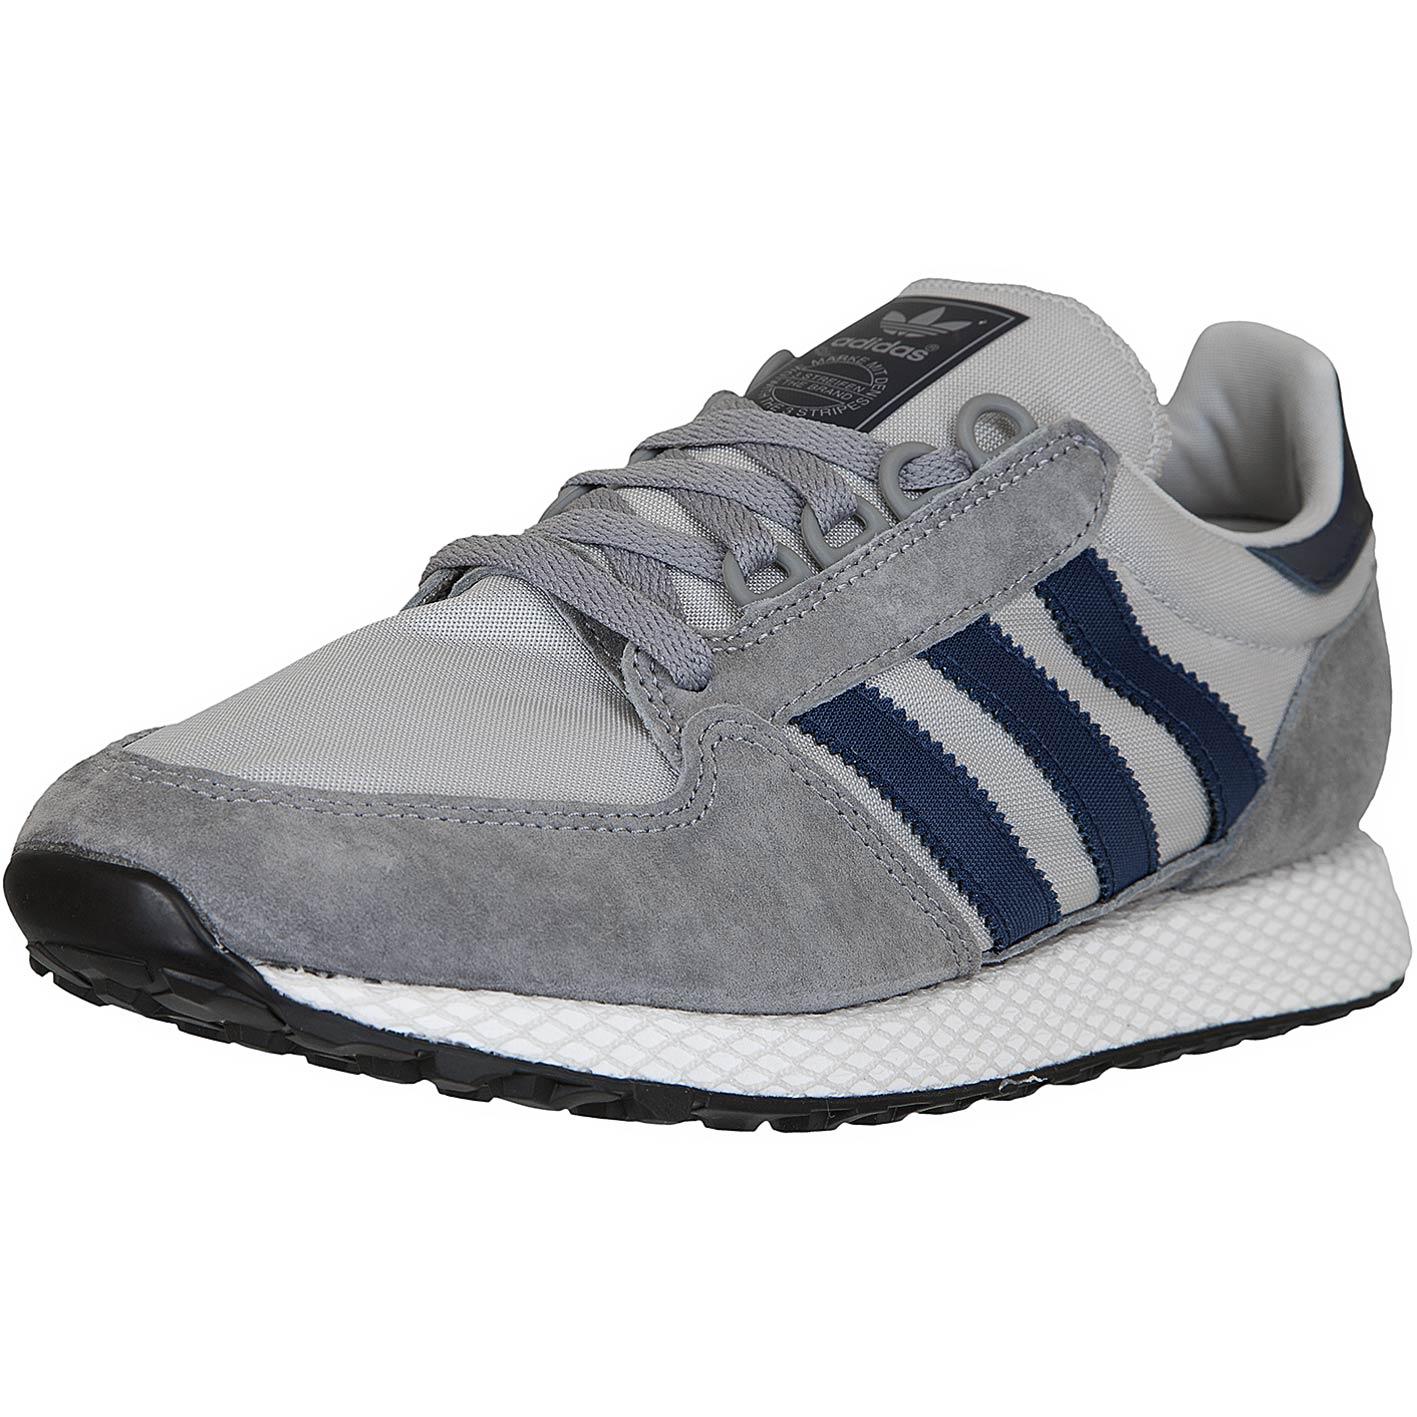 ADIDAS FOREST GROVE grau blau, Art. D96631, Herren Sneaker